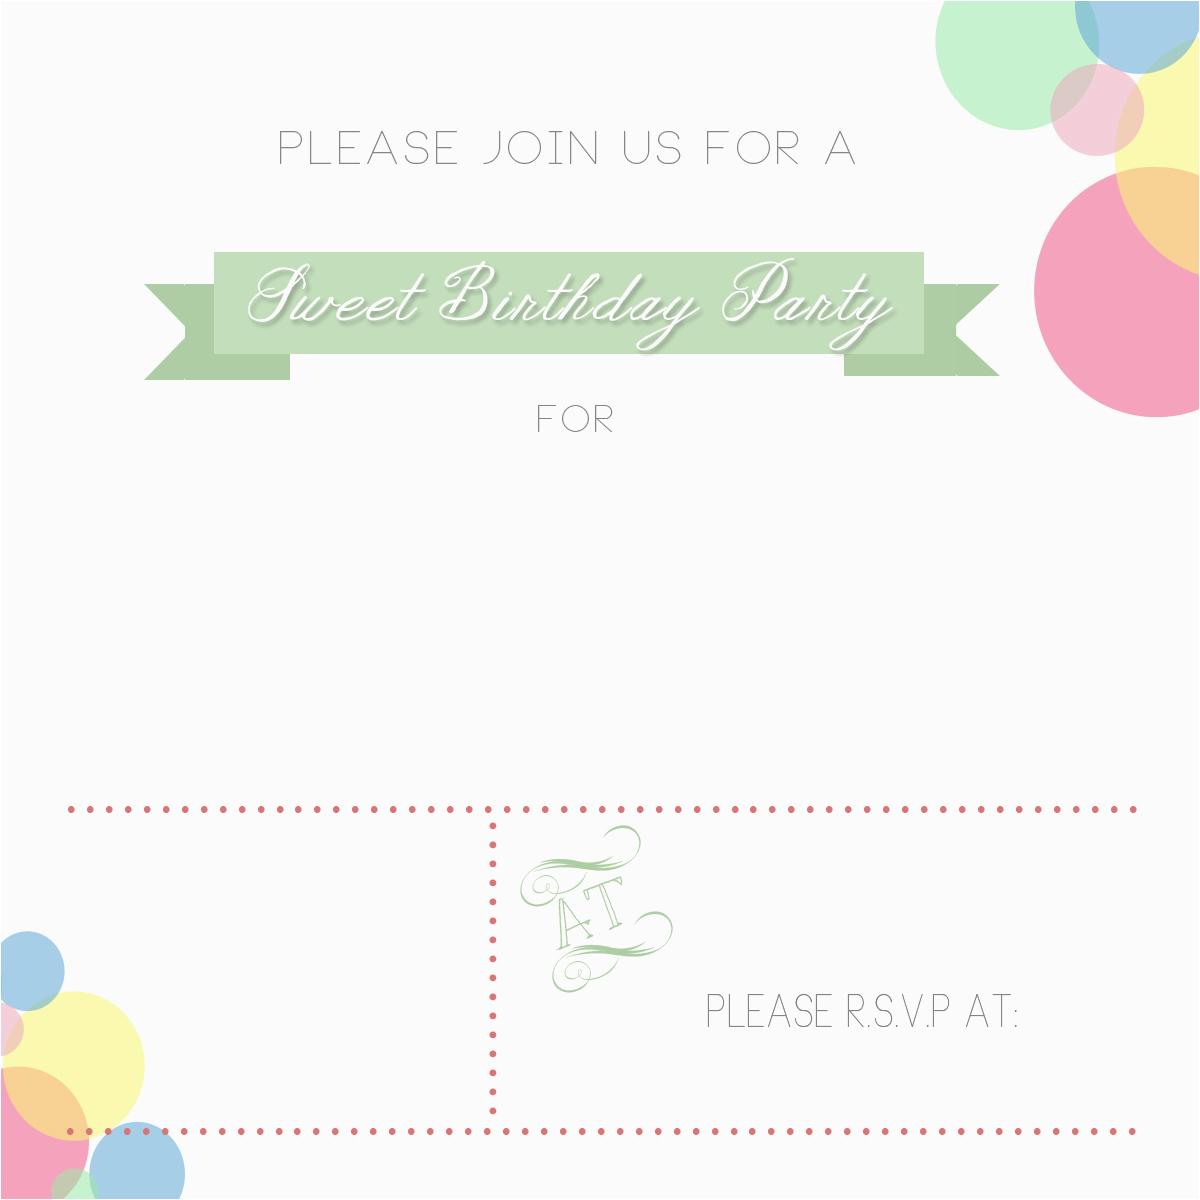 p plain birthday card invitation 1709260